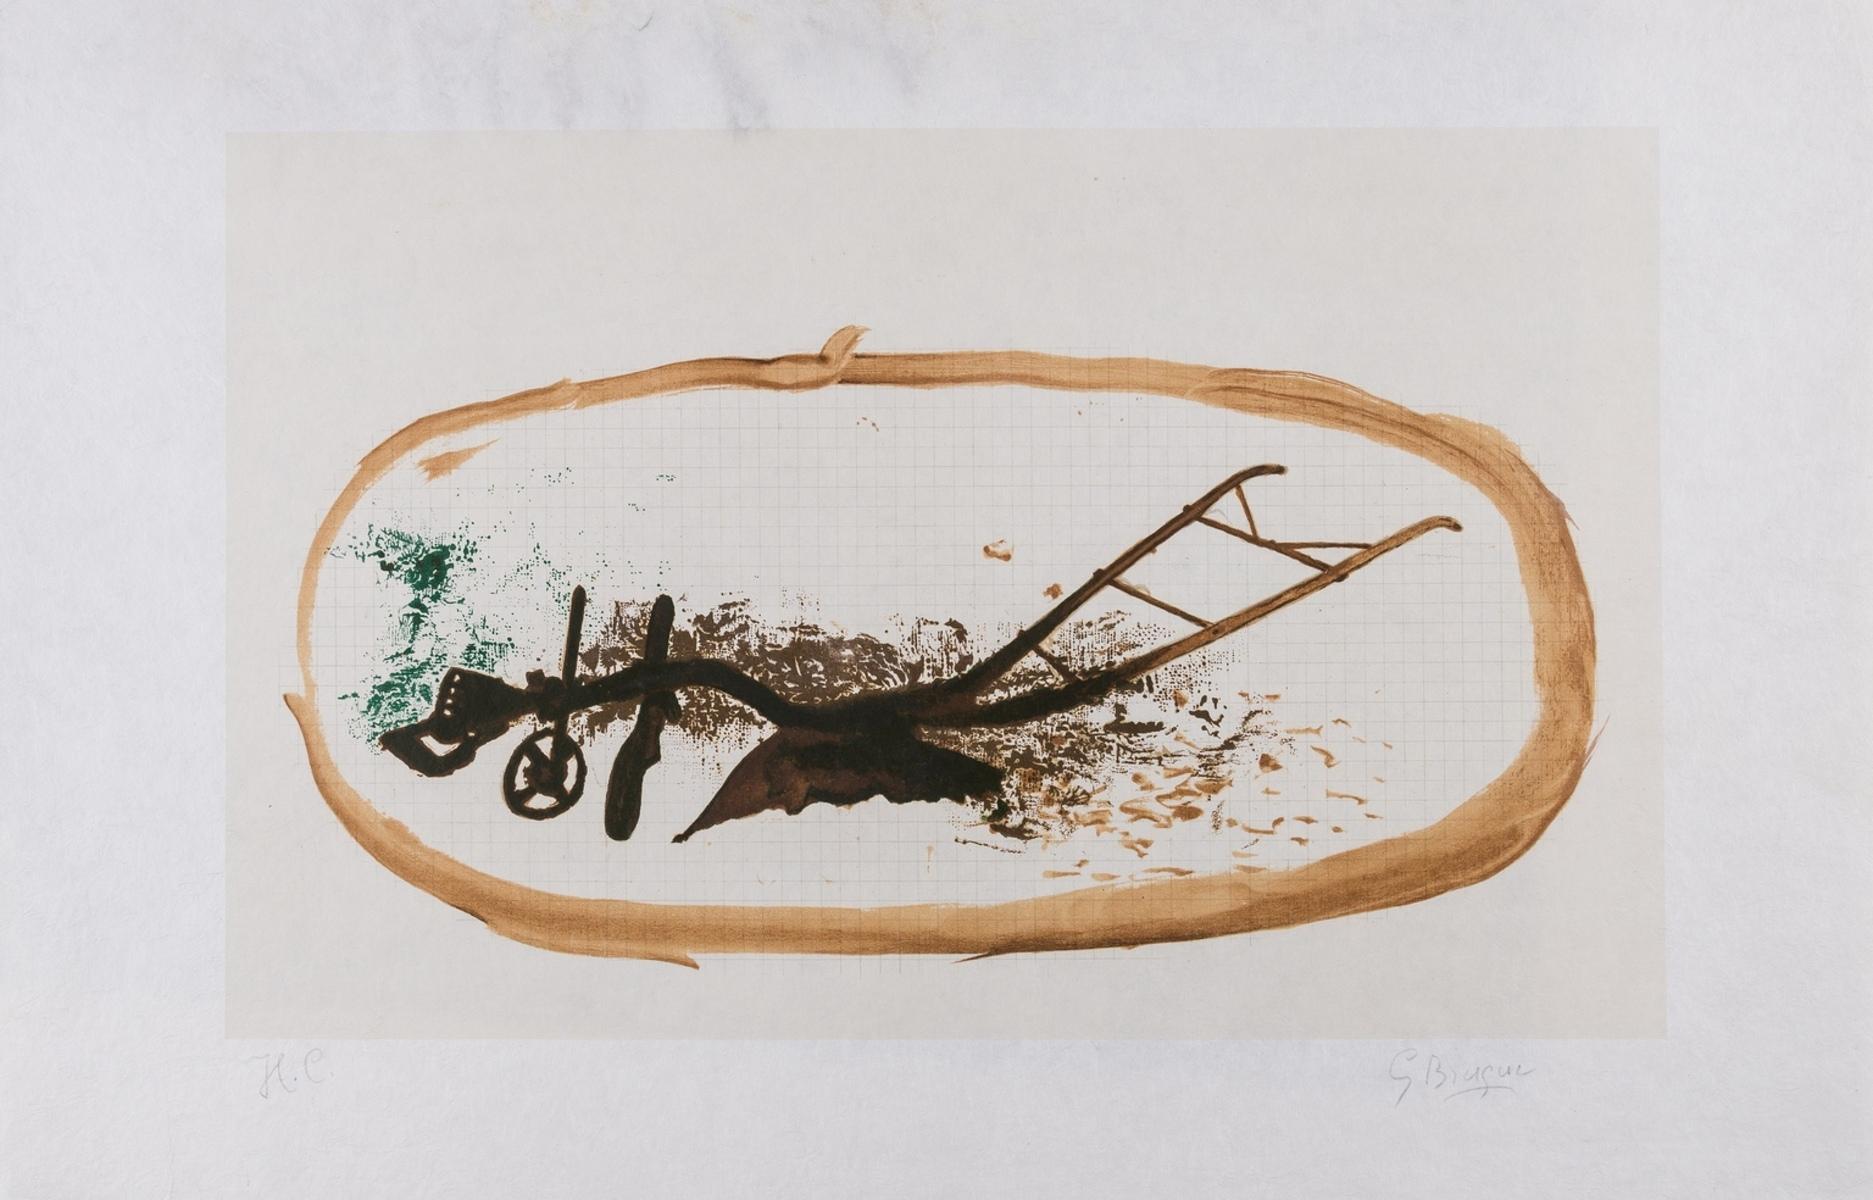 Georges Braque (1882-1963) La Charrue (Vallier 150)